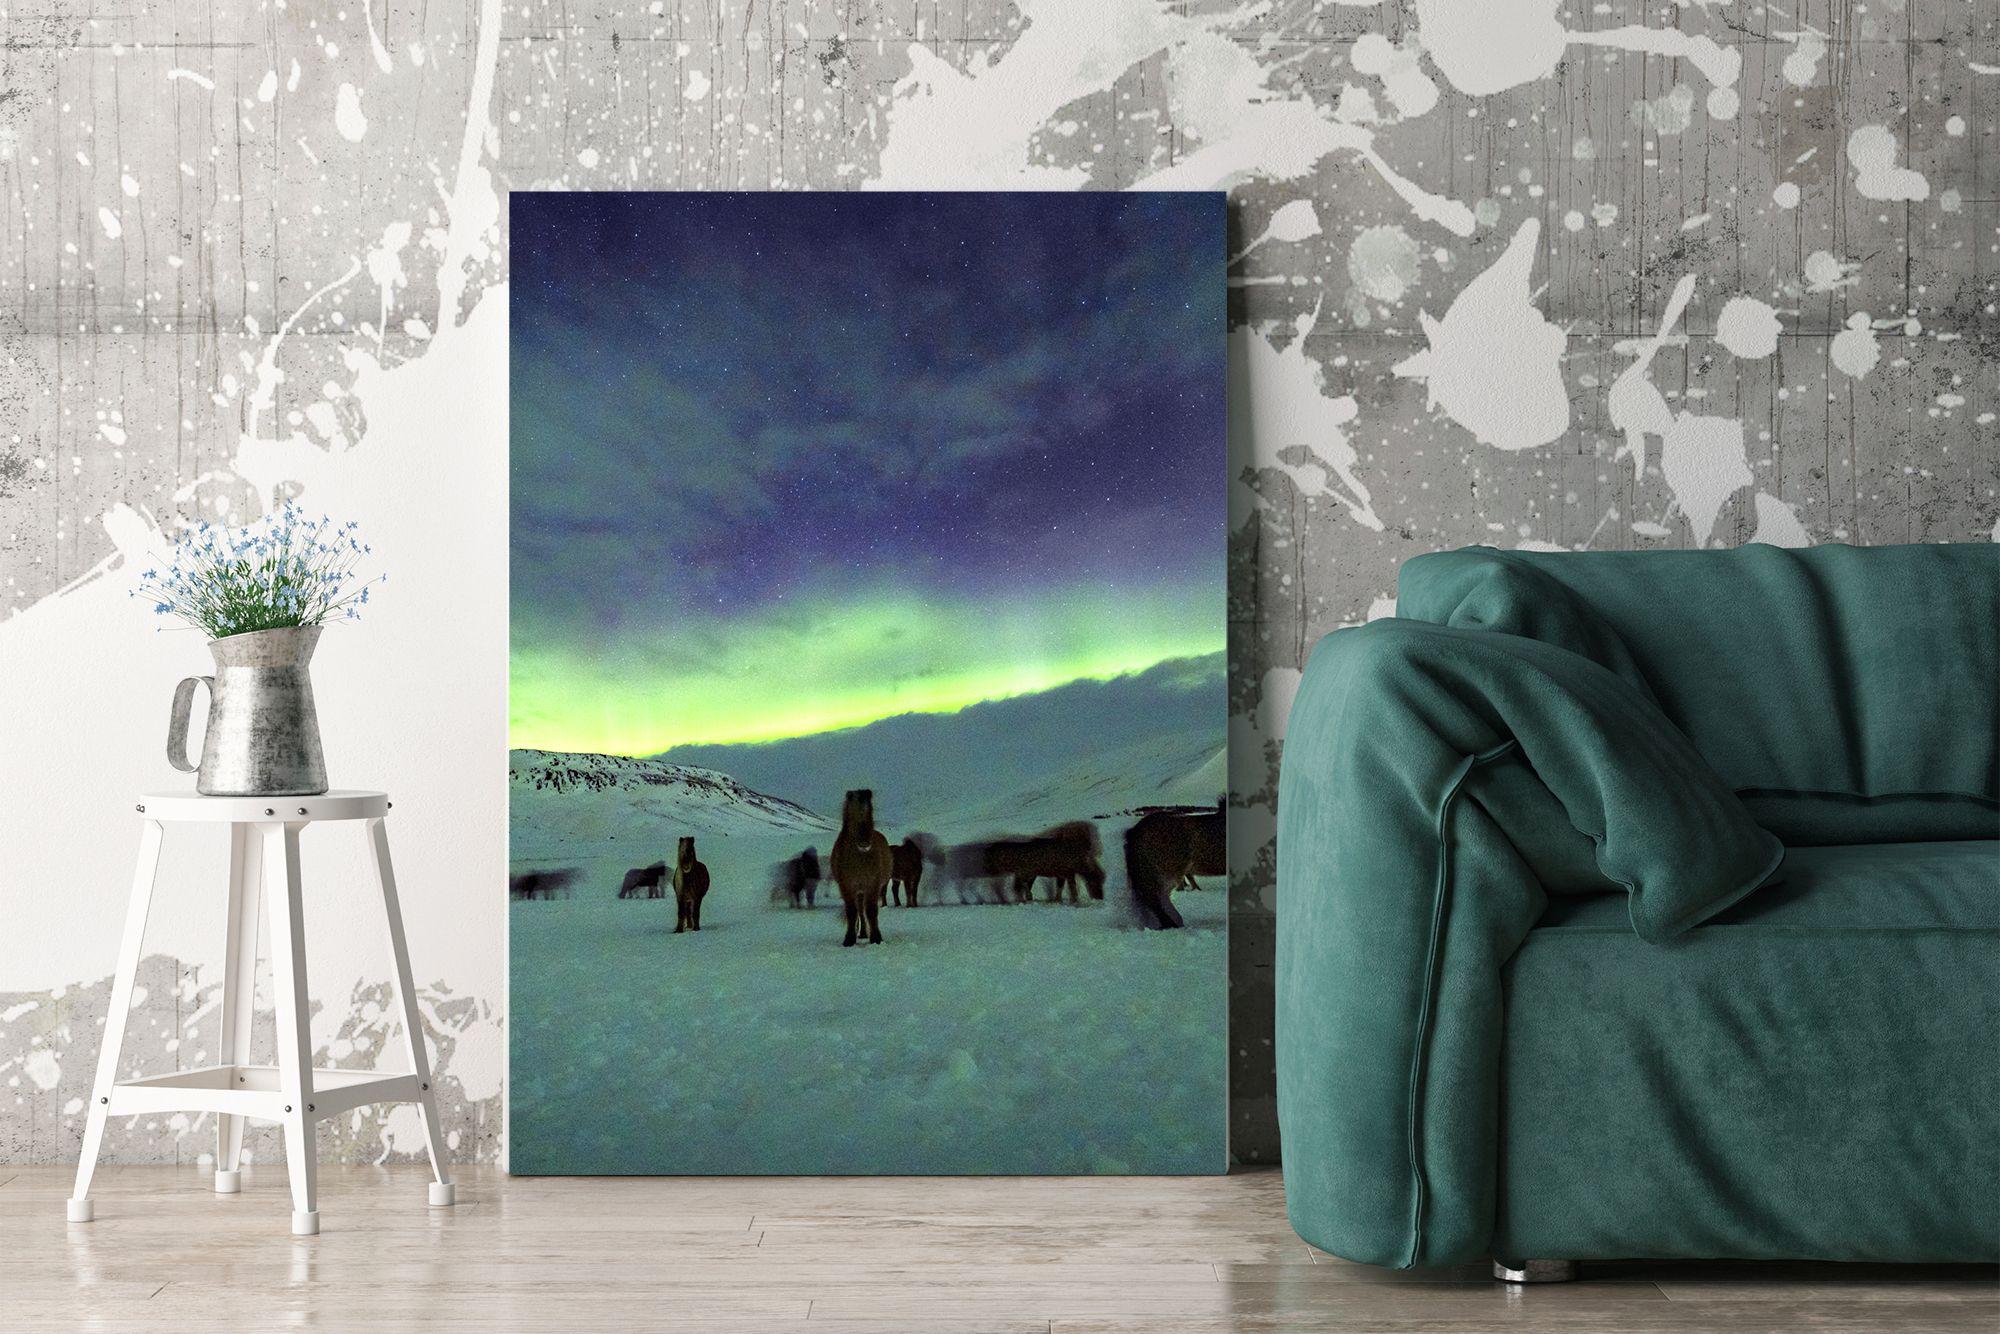 fotoleinwand wandbilder auf leinwand 40x30 foto günstig